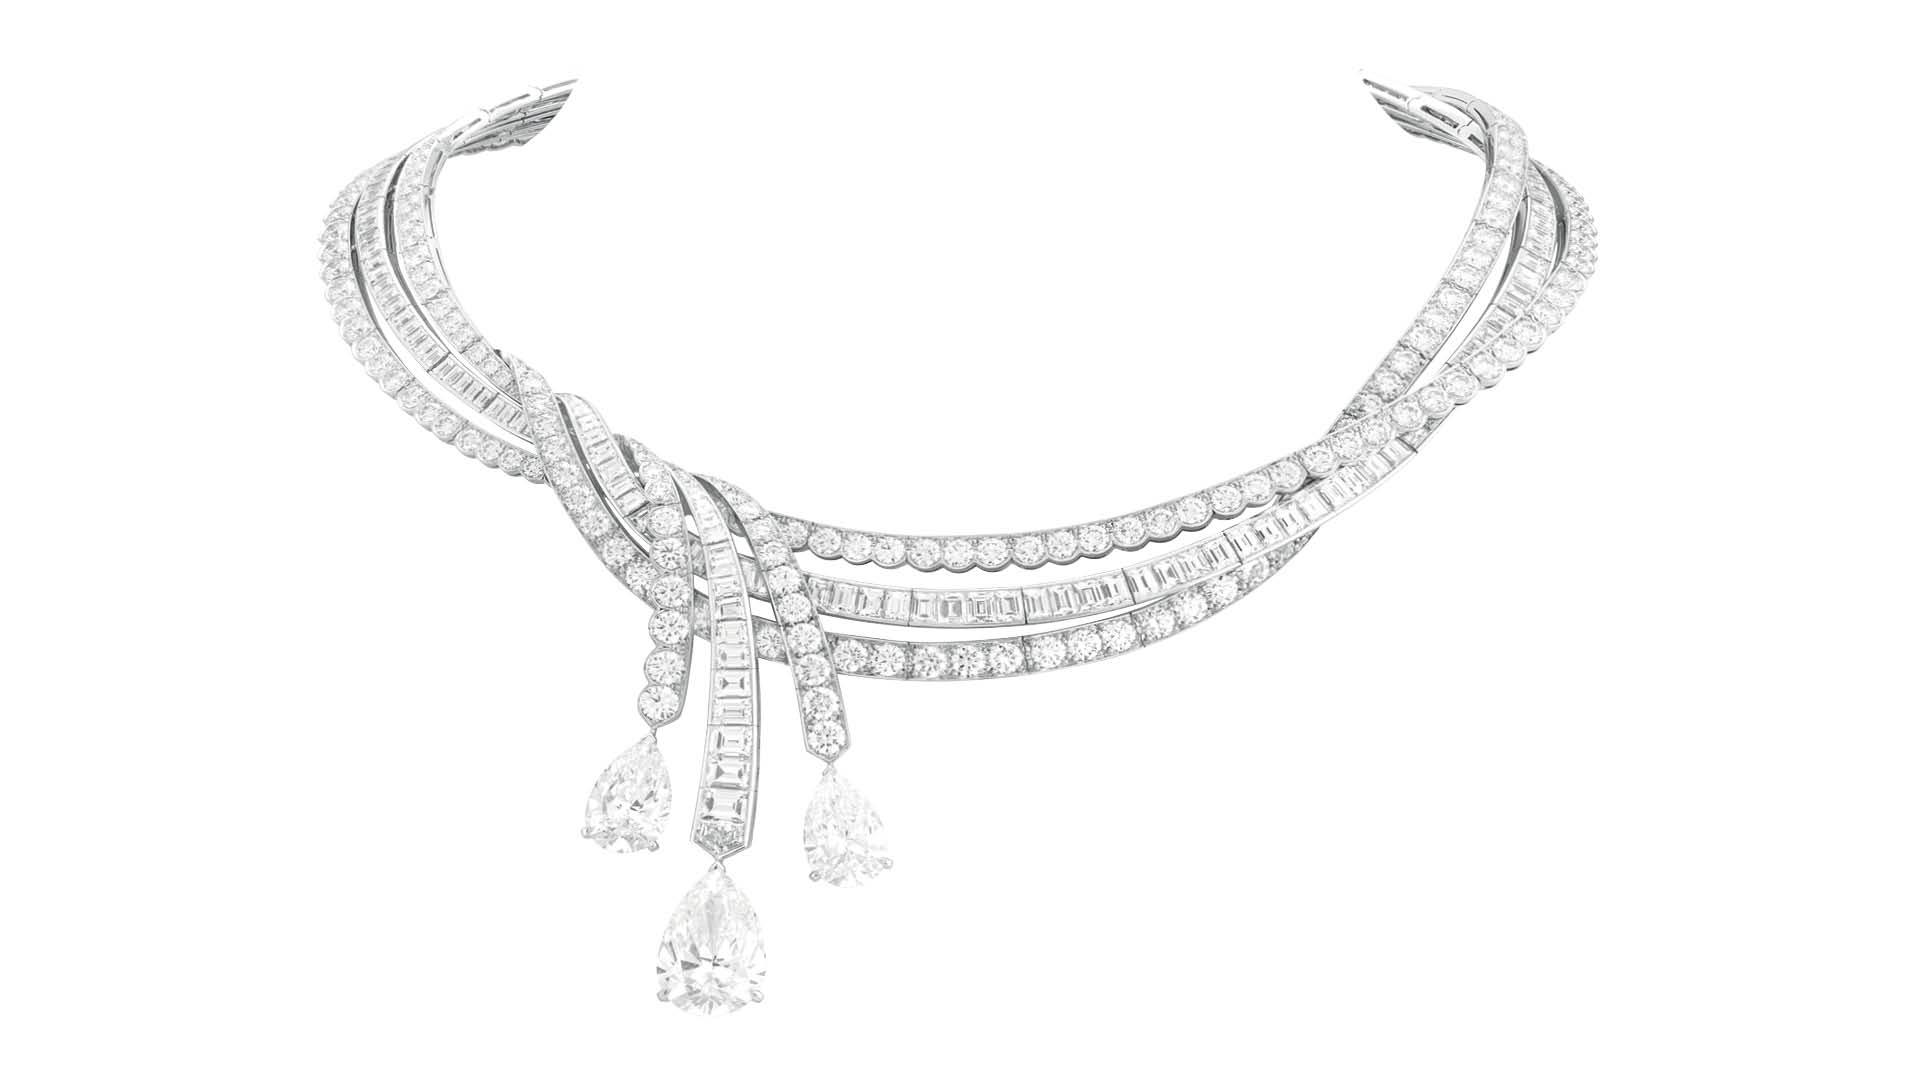 Van-Cleef-Arpels-Grimm-Rubans-de-princesse-necklace